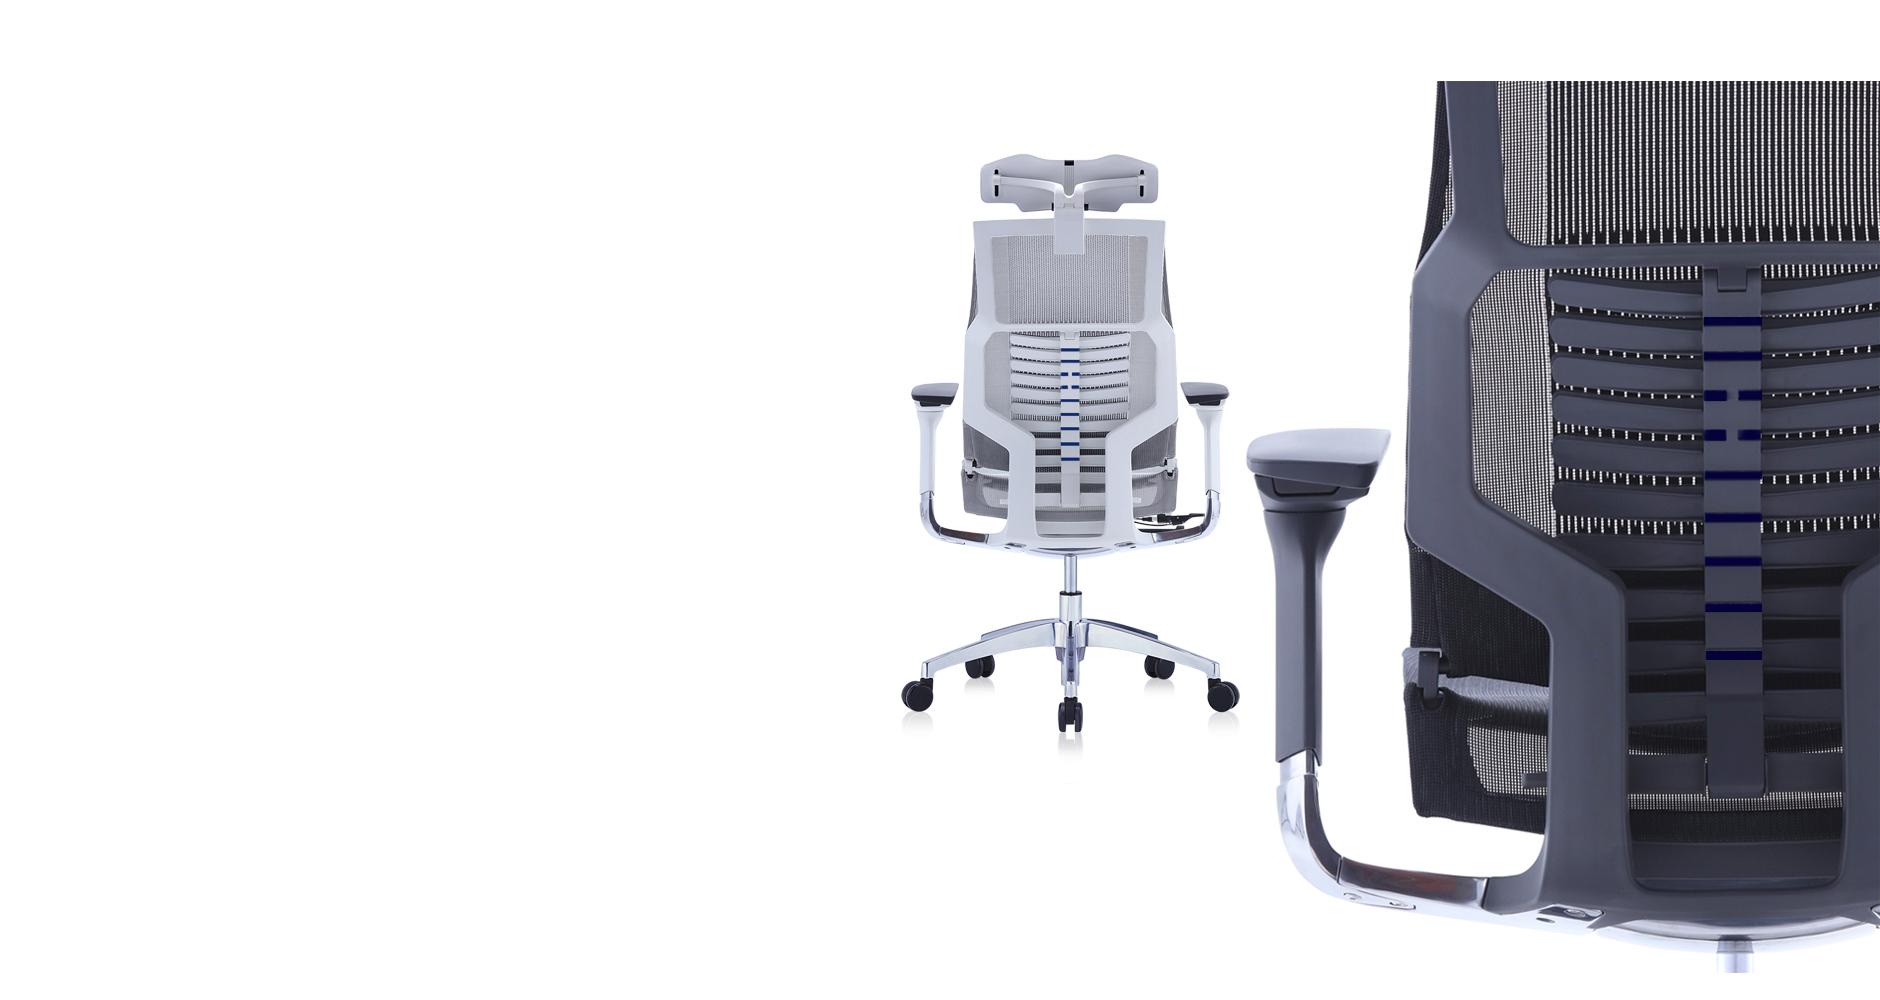 Pofit versatility POFIT redefines ergonomic chair